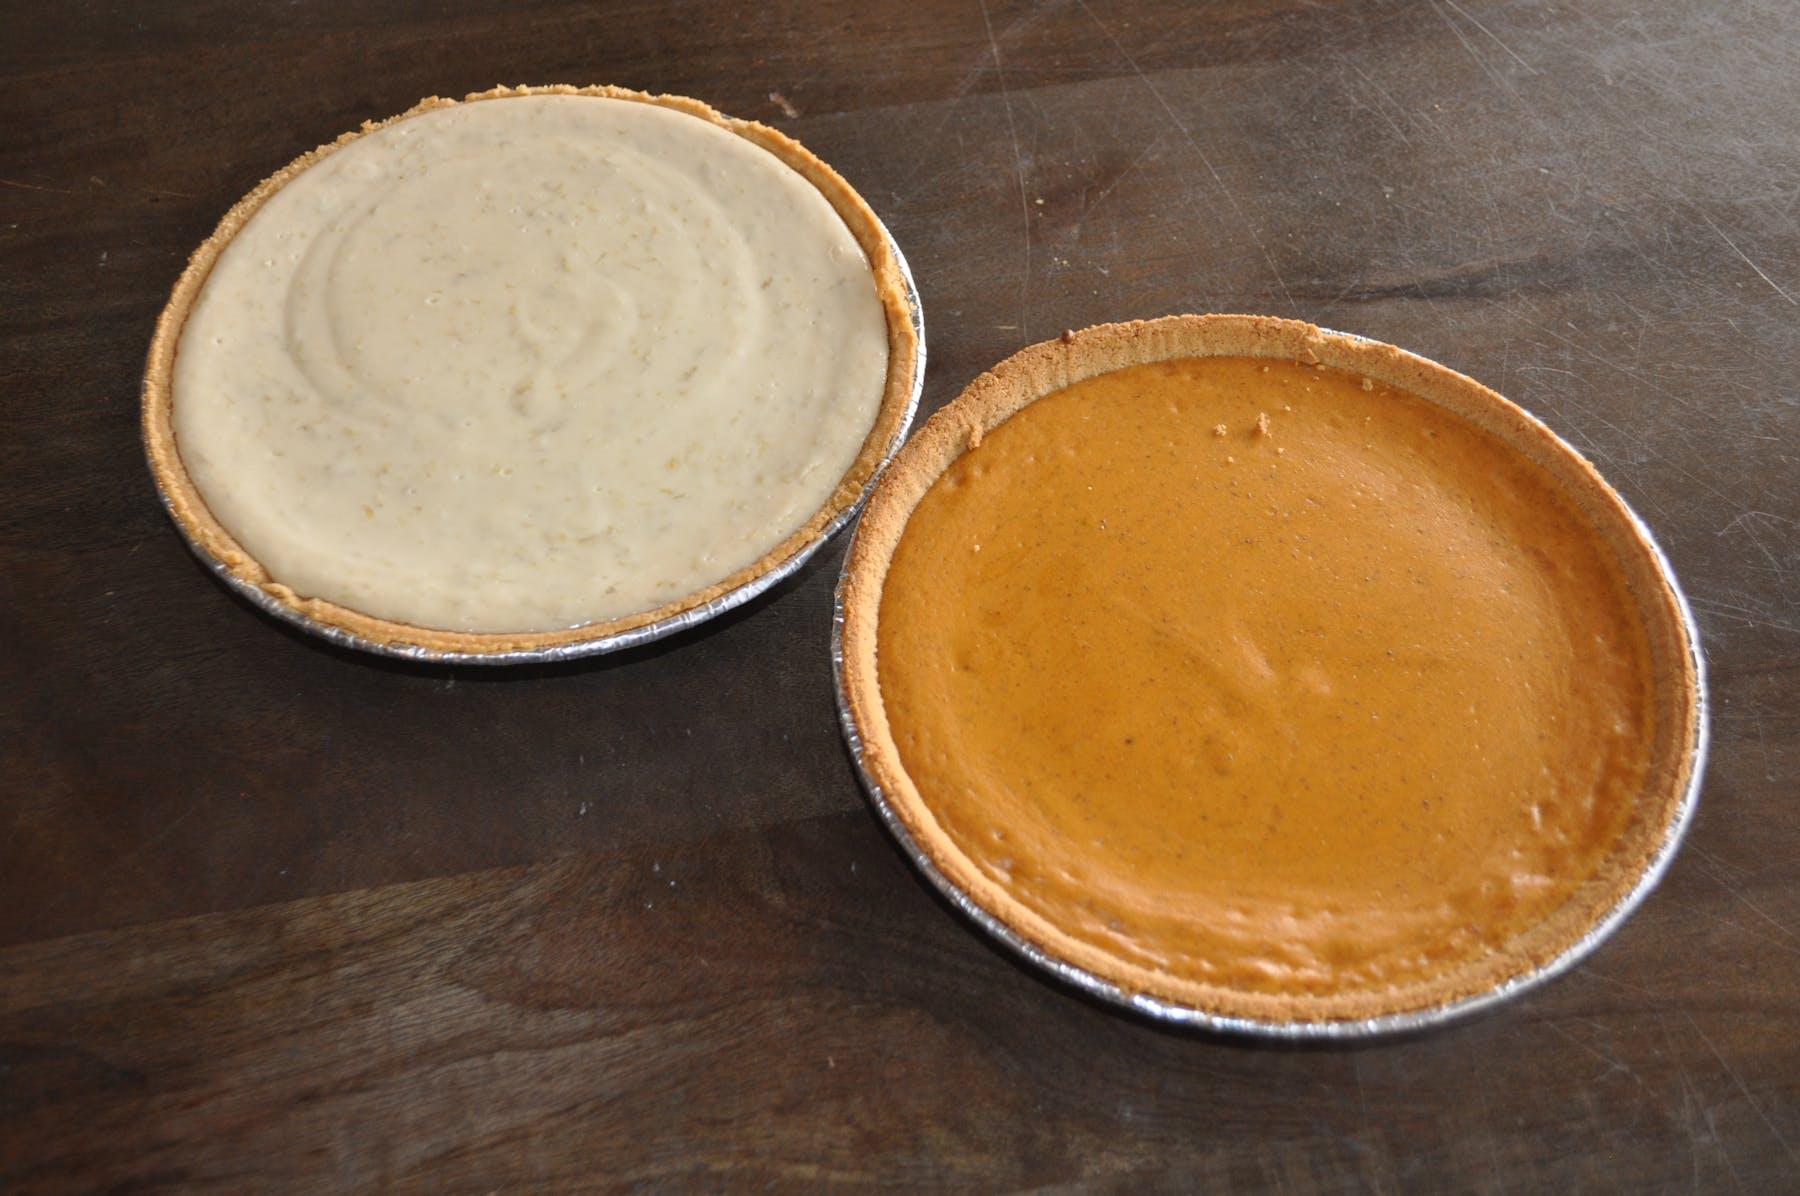 Key Lime Pie & Pumkin Pie on a table